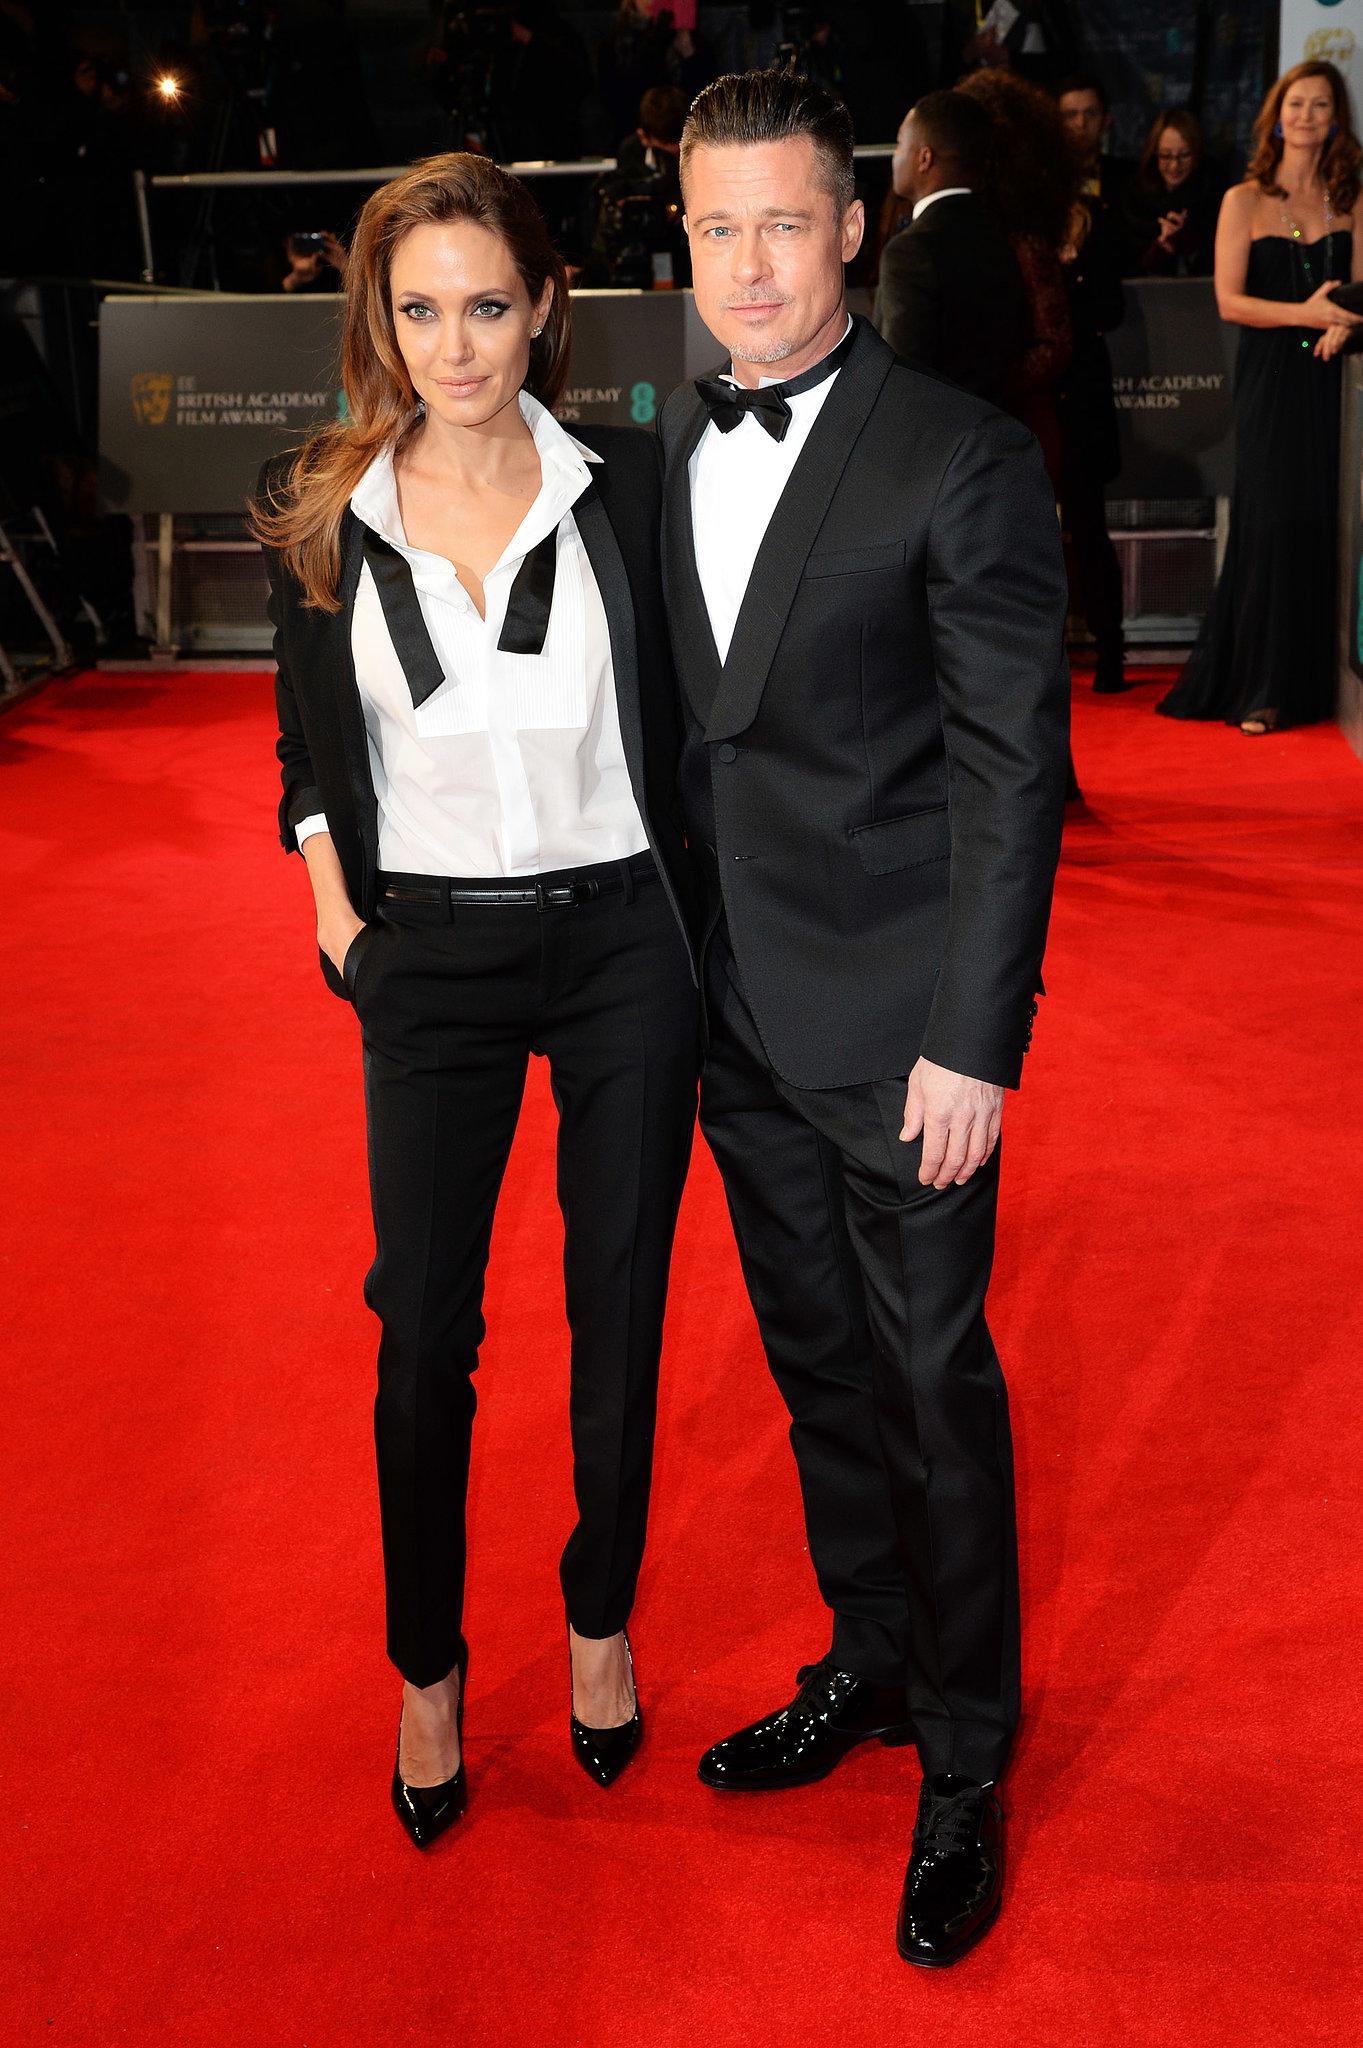 Angelina Jolie and Brad Pitt on the 2014 BAFTA Red Carpet